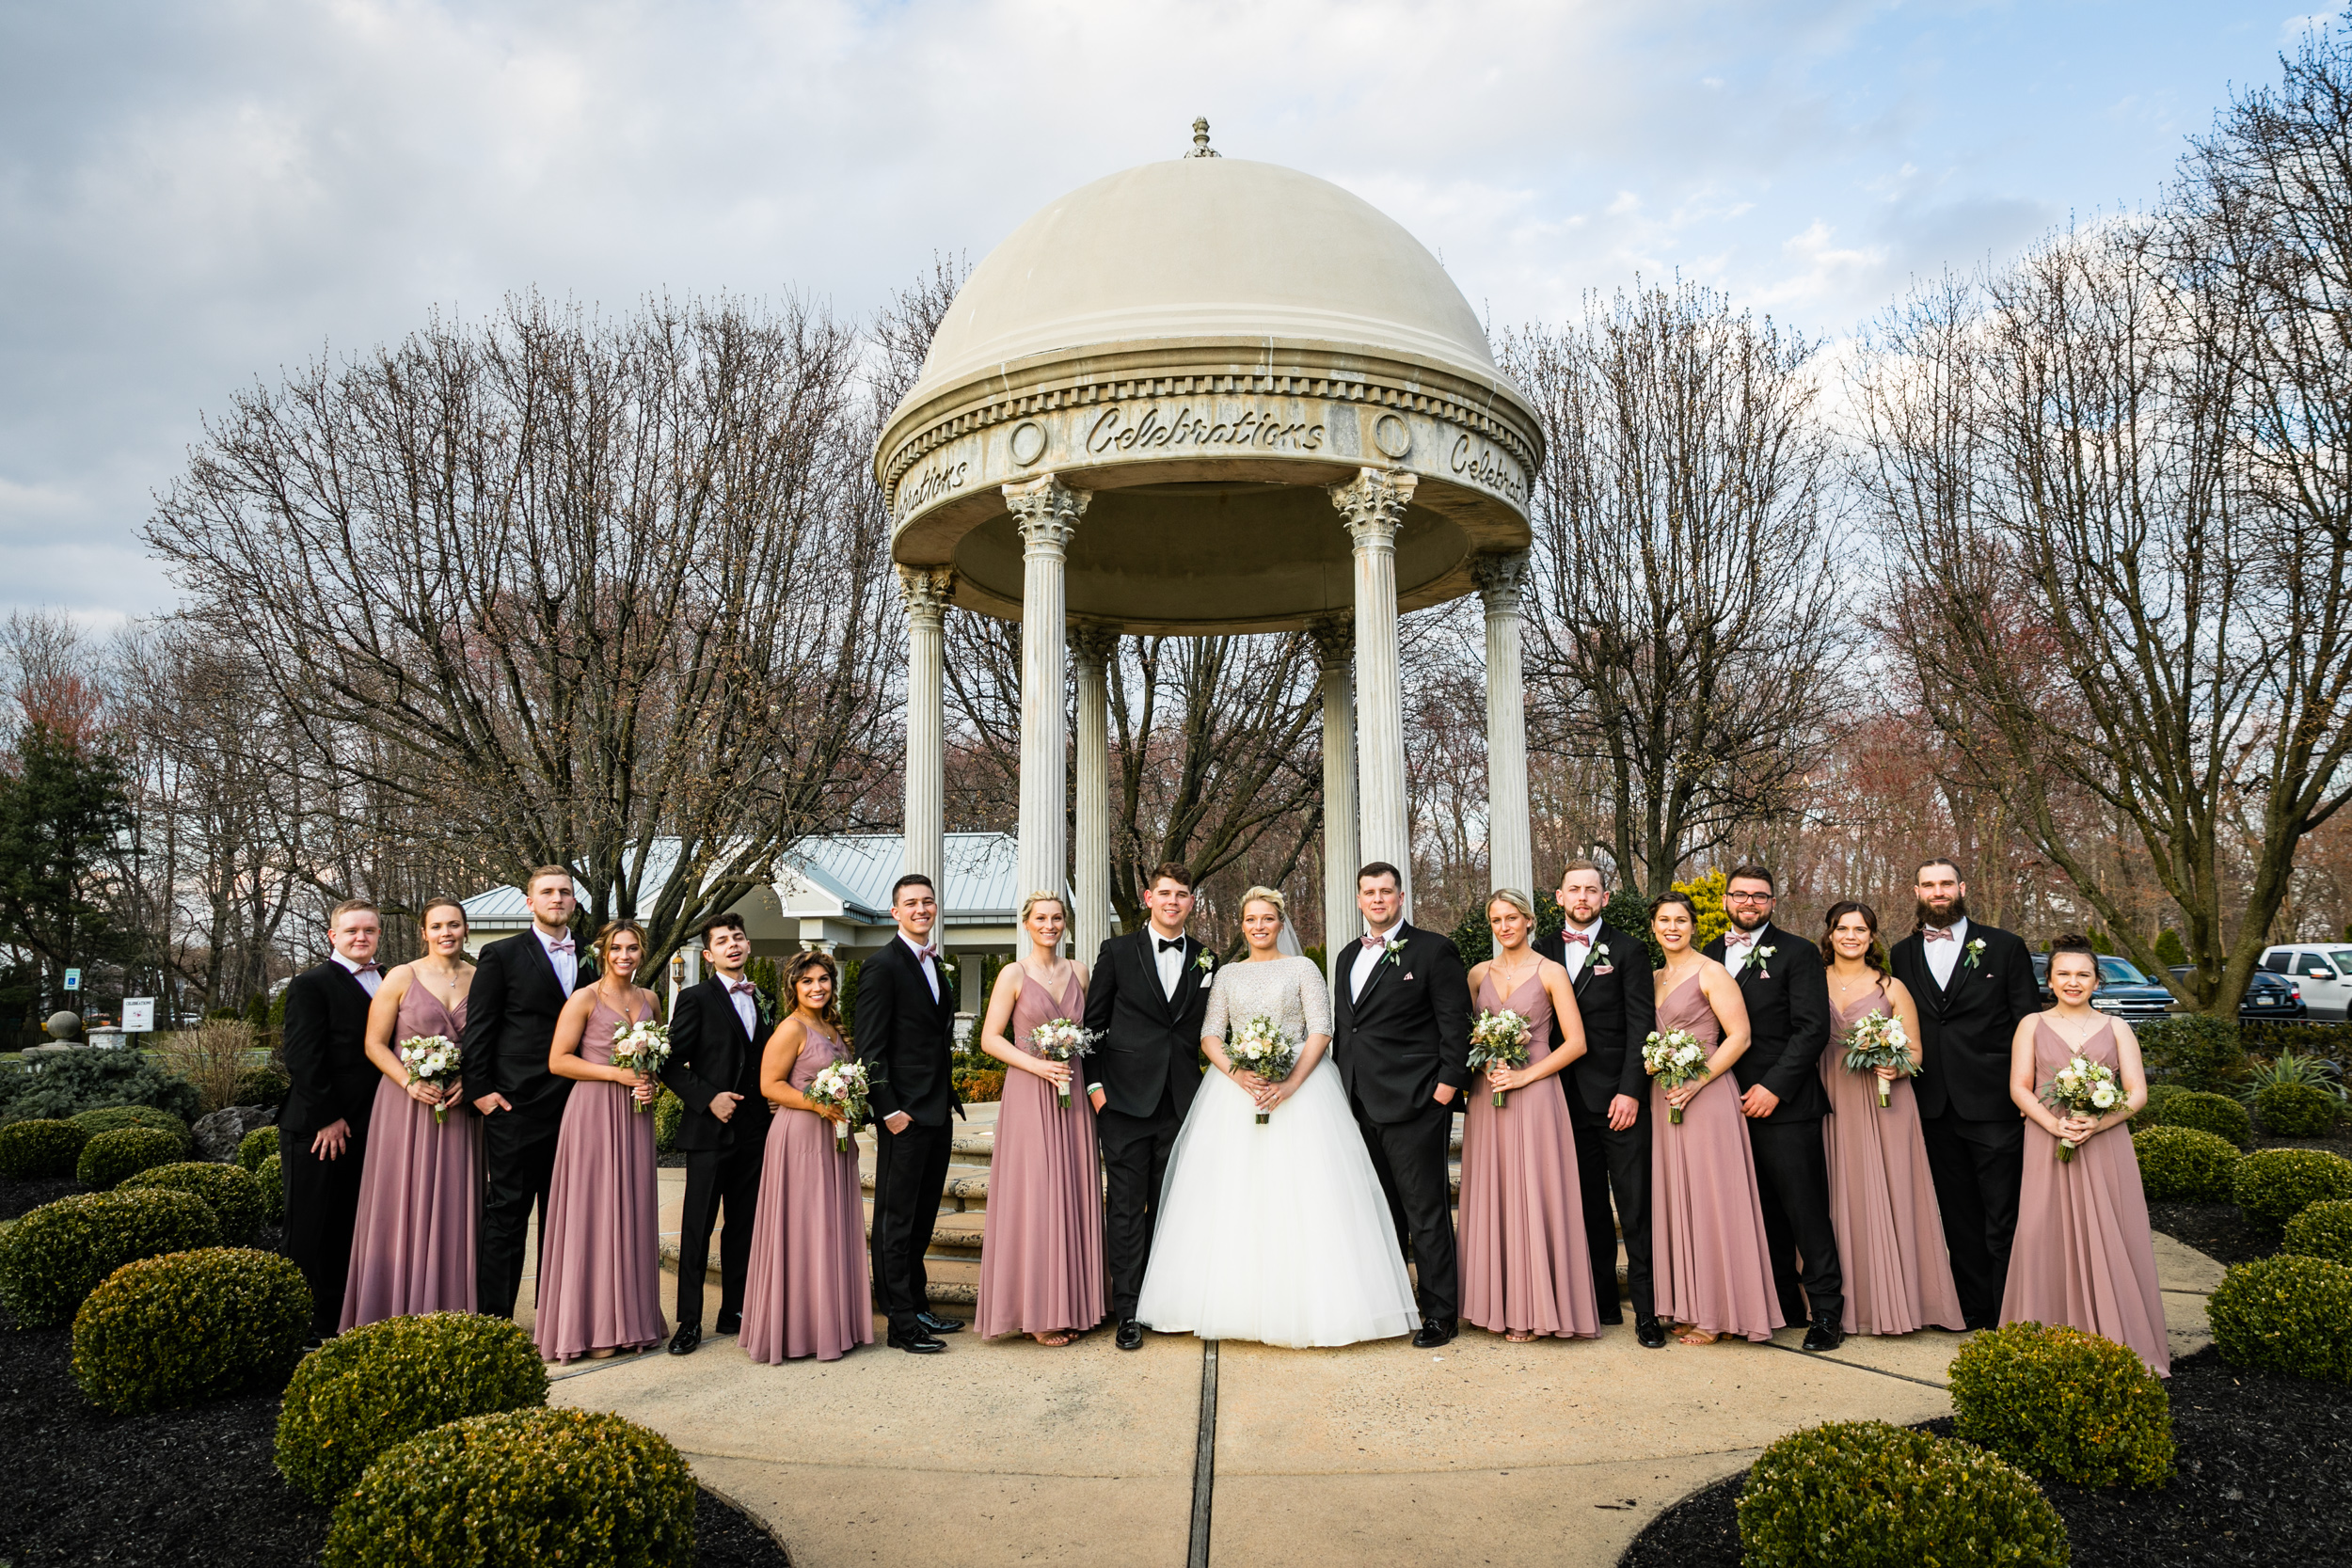 CELEBRATIONS BENSALEM WEDDING PHOTOGRAPHY-58.jpg